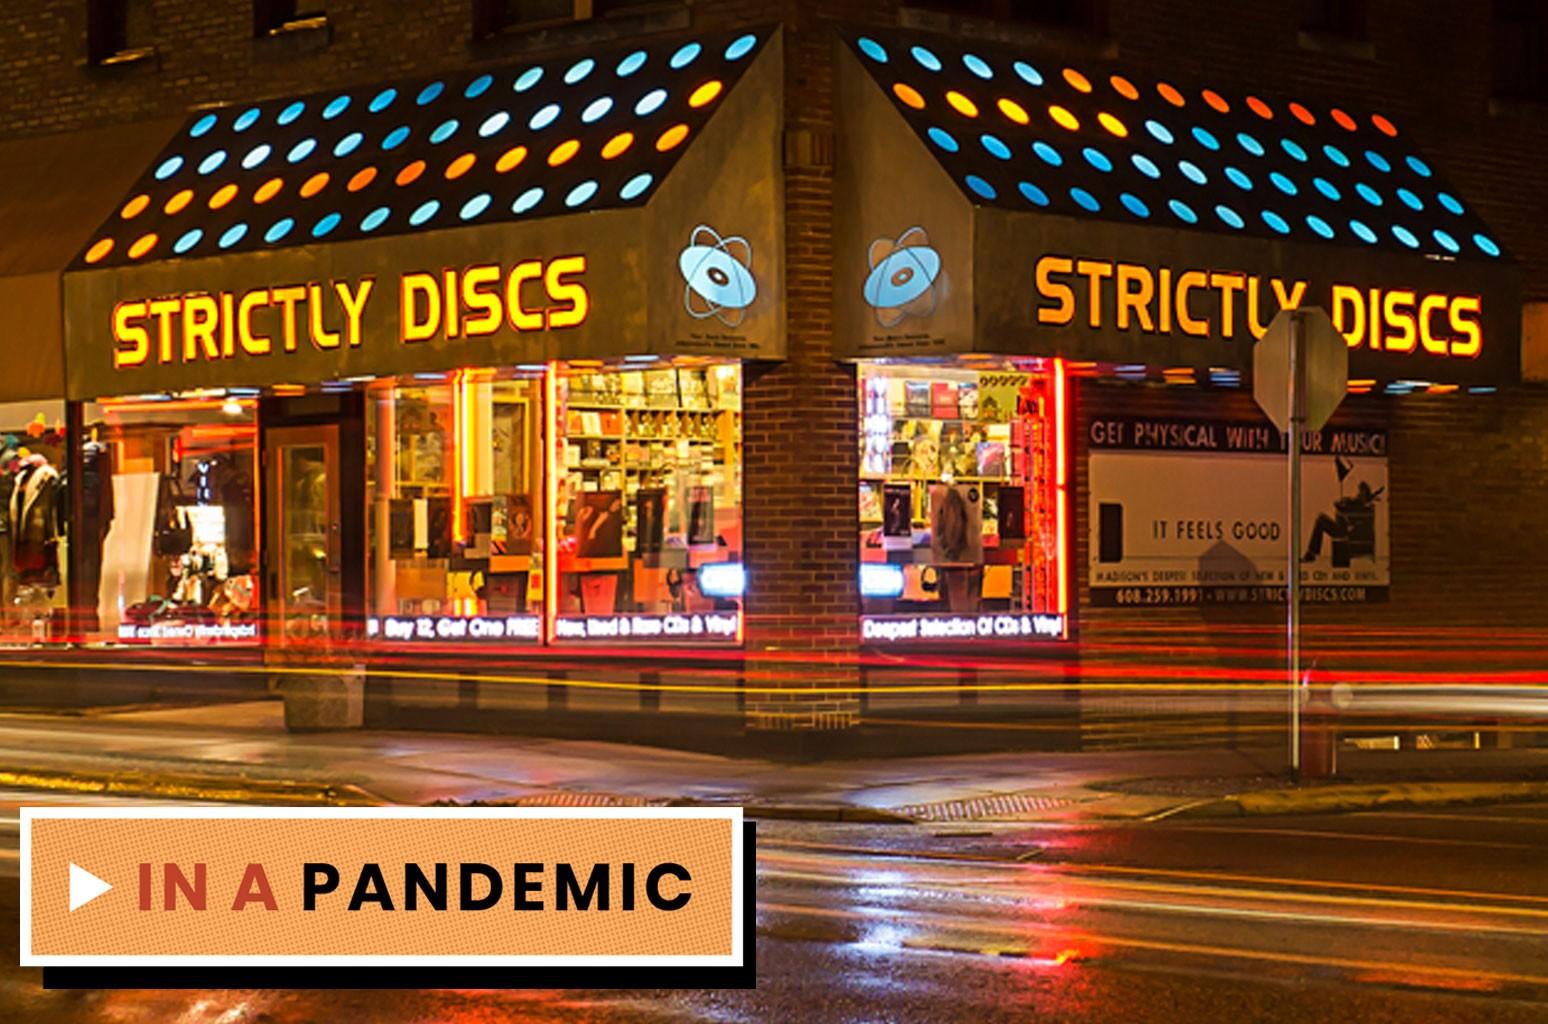 Strictly Discs